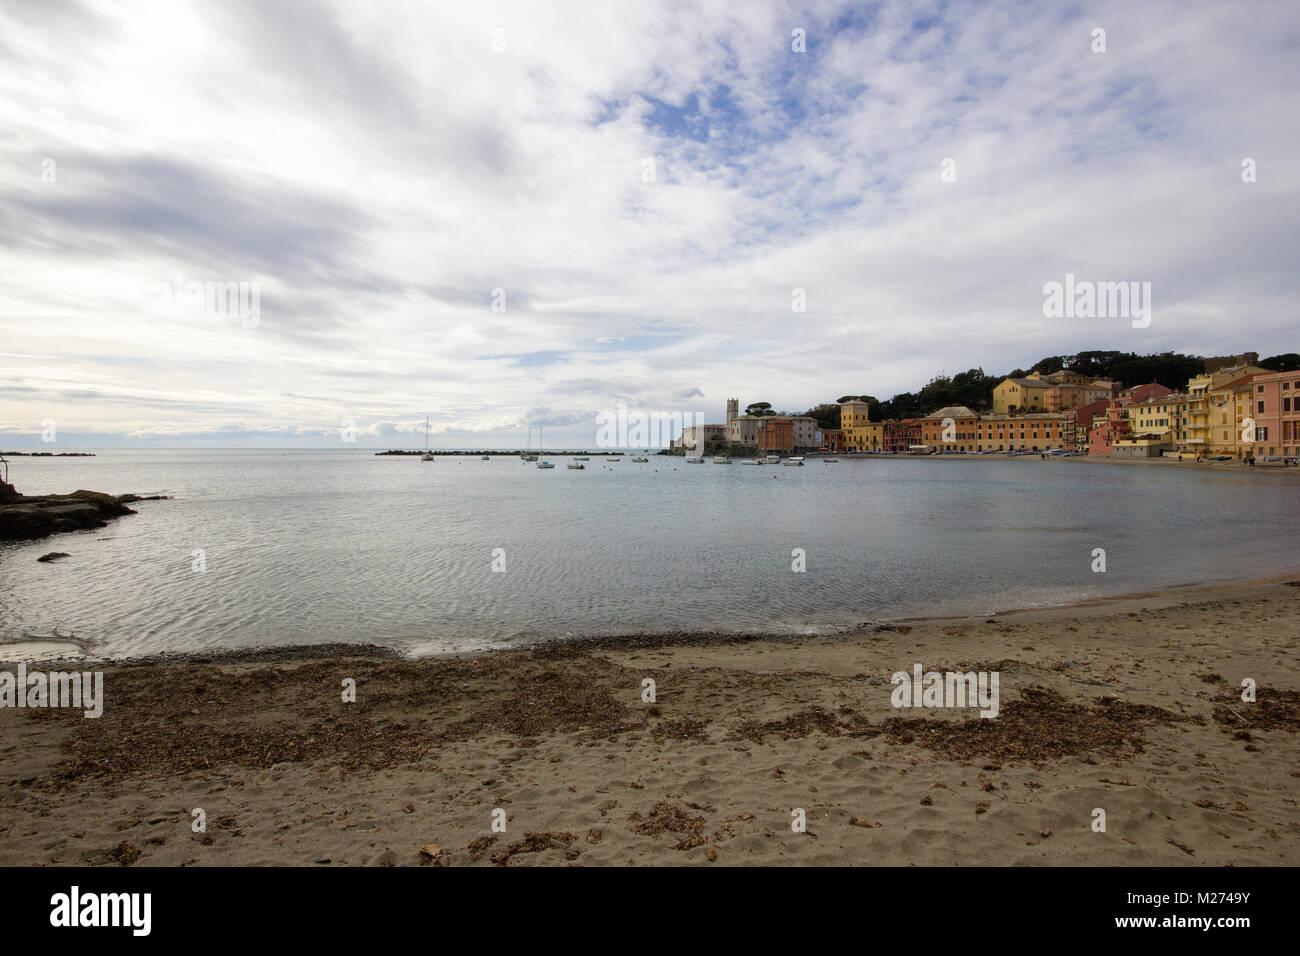 "a beautiful view of the ""Bay of Silence"", La Baia del silenzio, Sestri Levante, Genoa, Italy during the winter season Stock Photo"